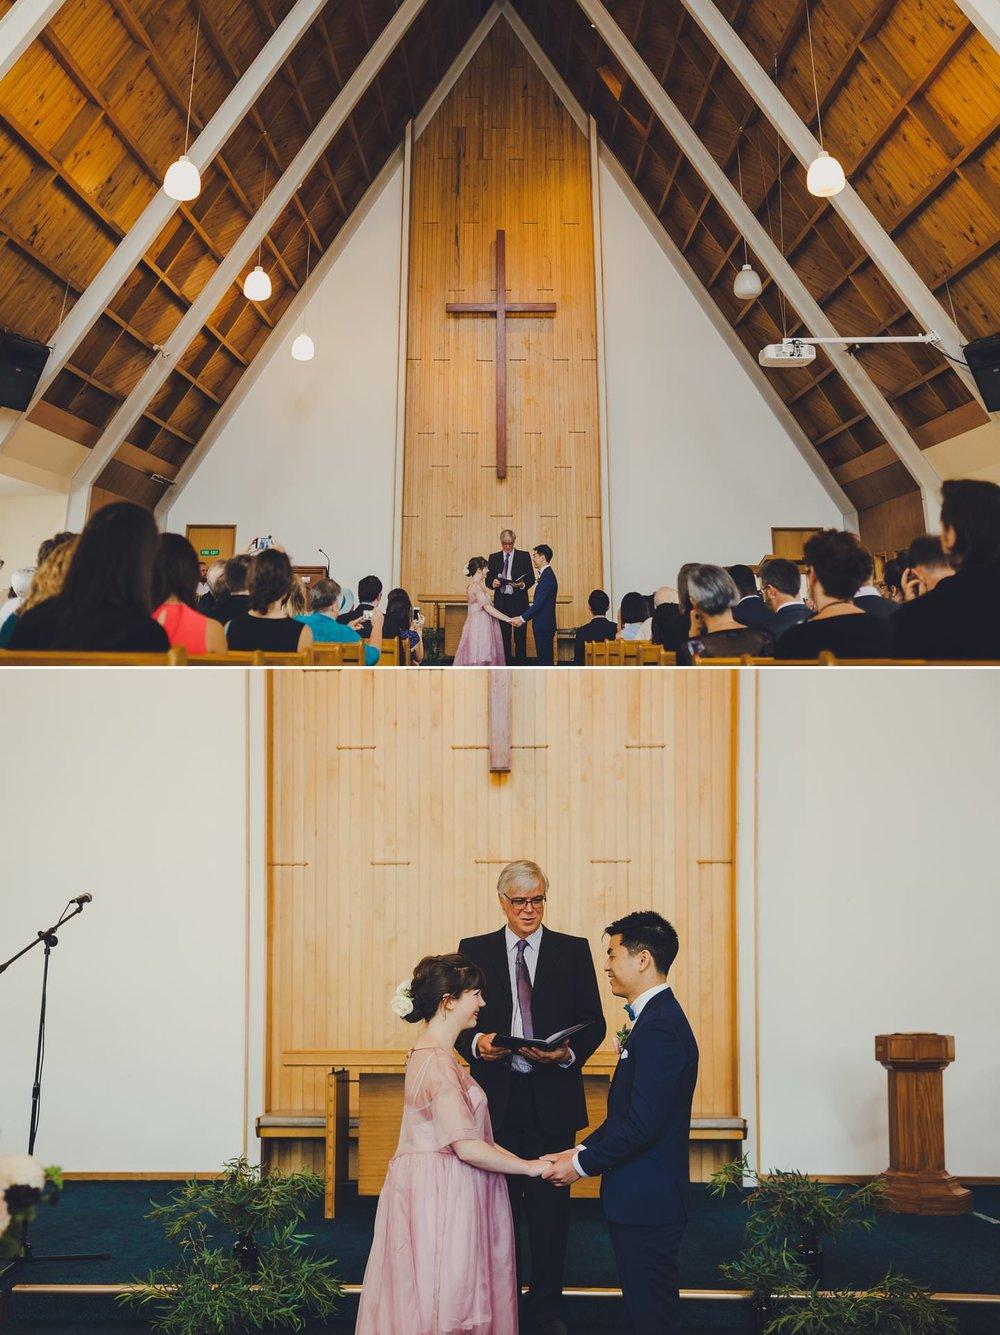 Wedding ceremony held at Island Bay Presbyterian Church